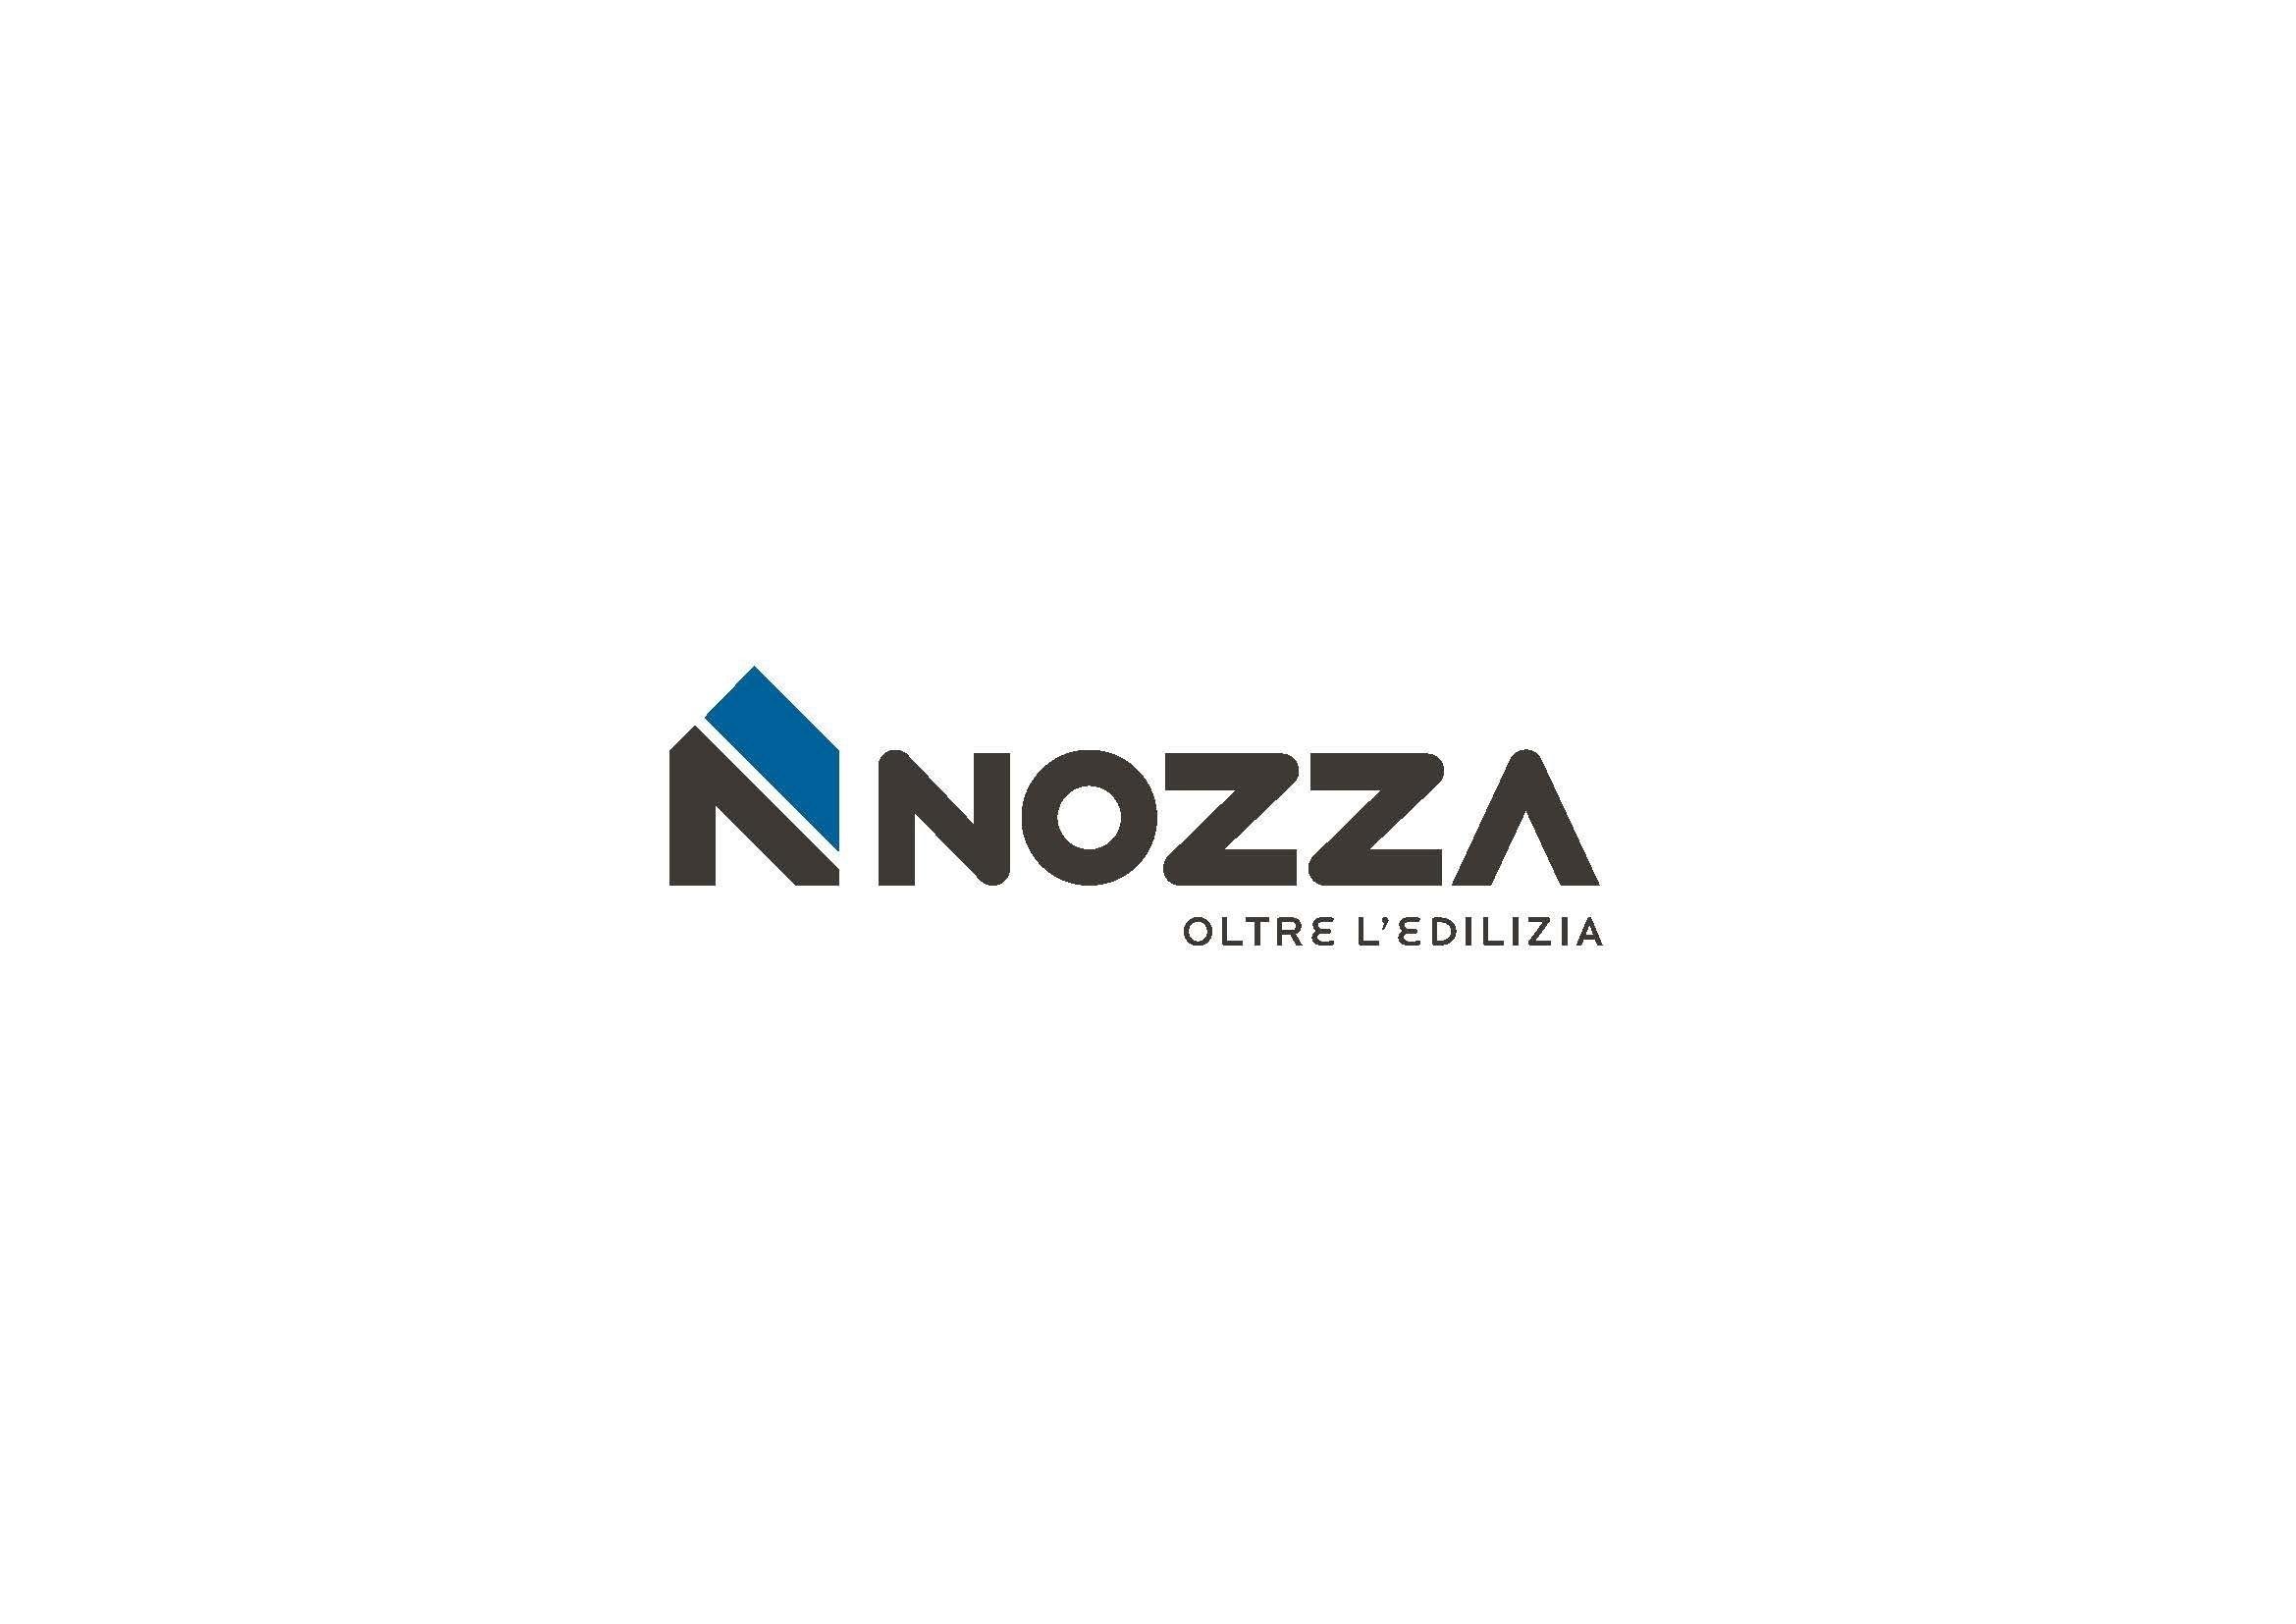 Nozza Edilizia logo